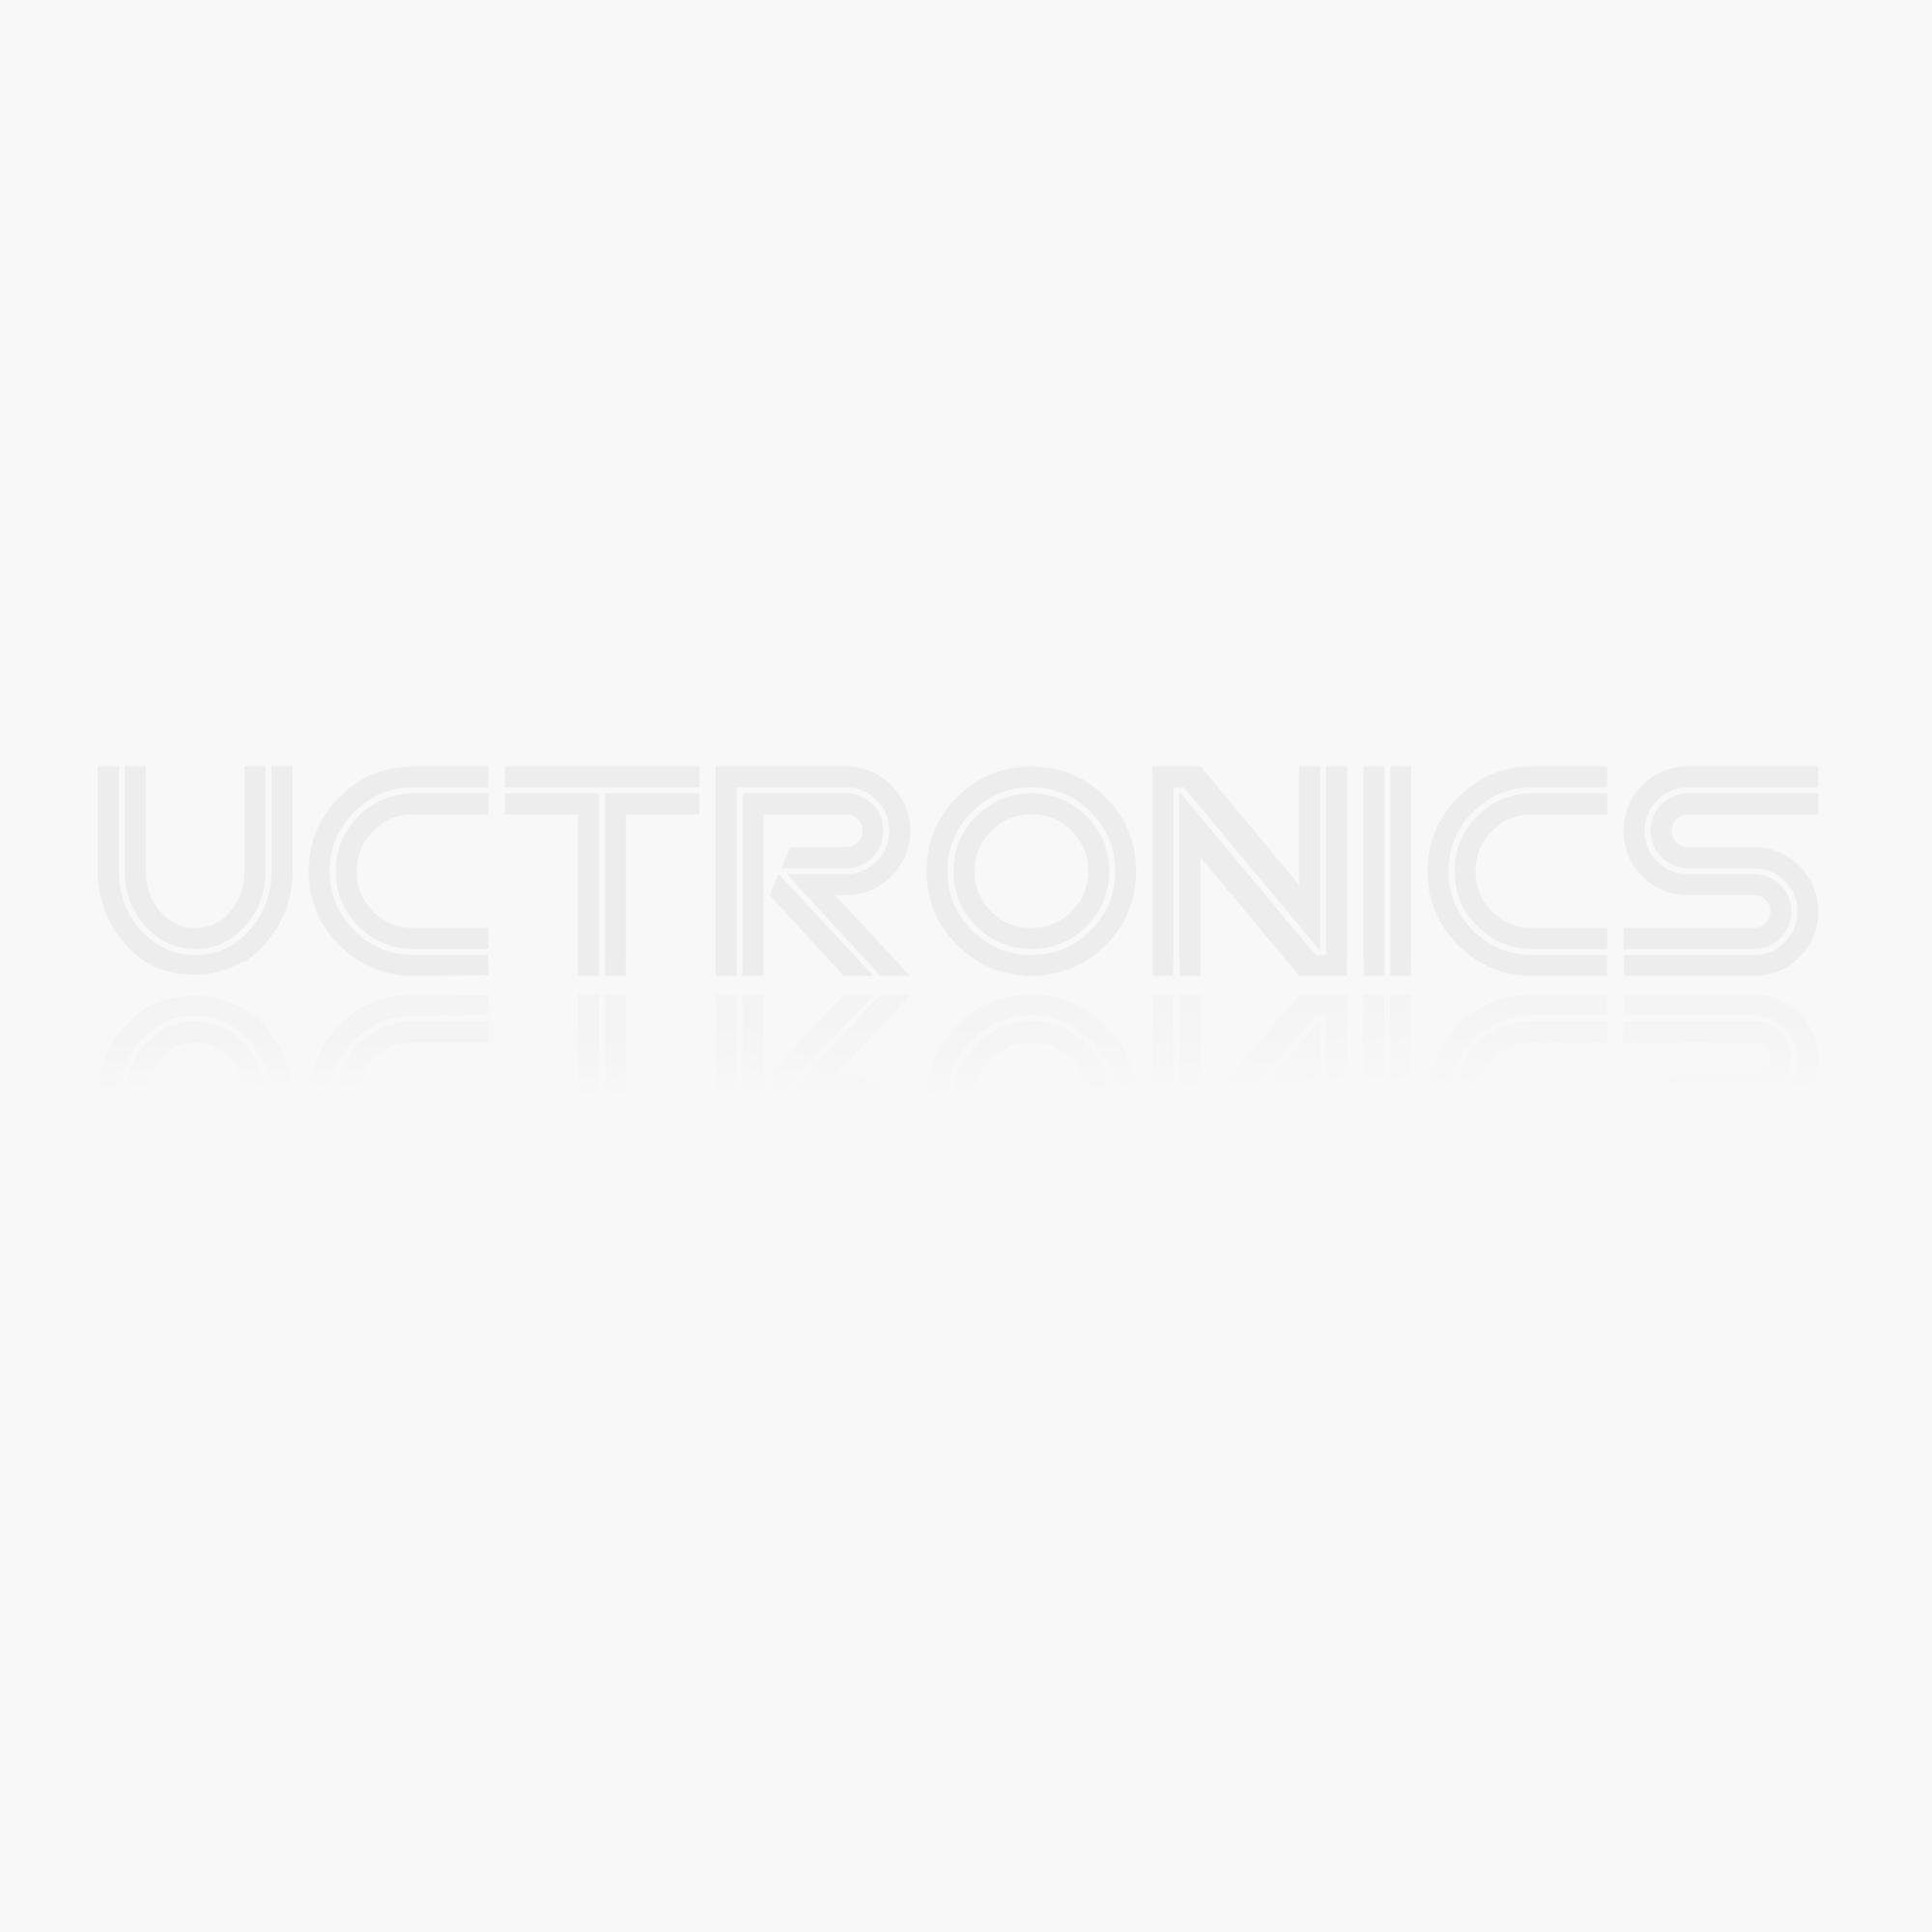 Virtual COM Port Drivers - FTDI Chip Home Page